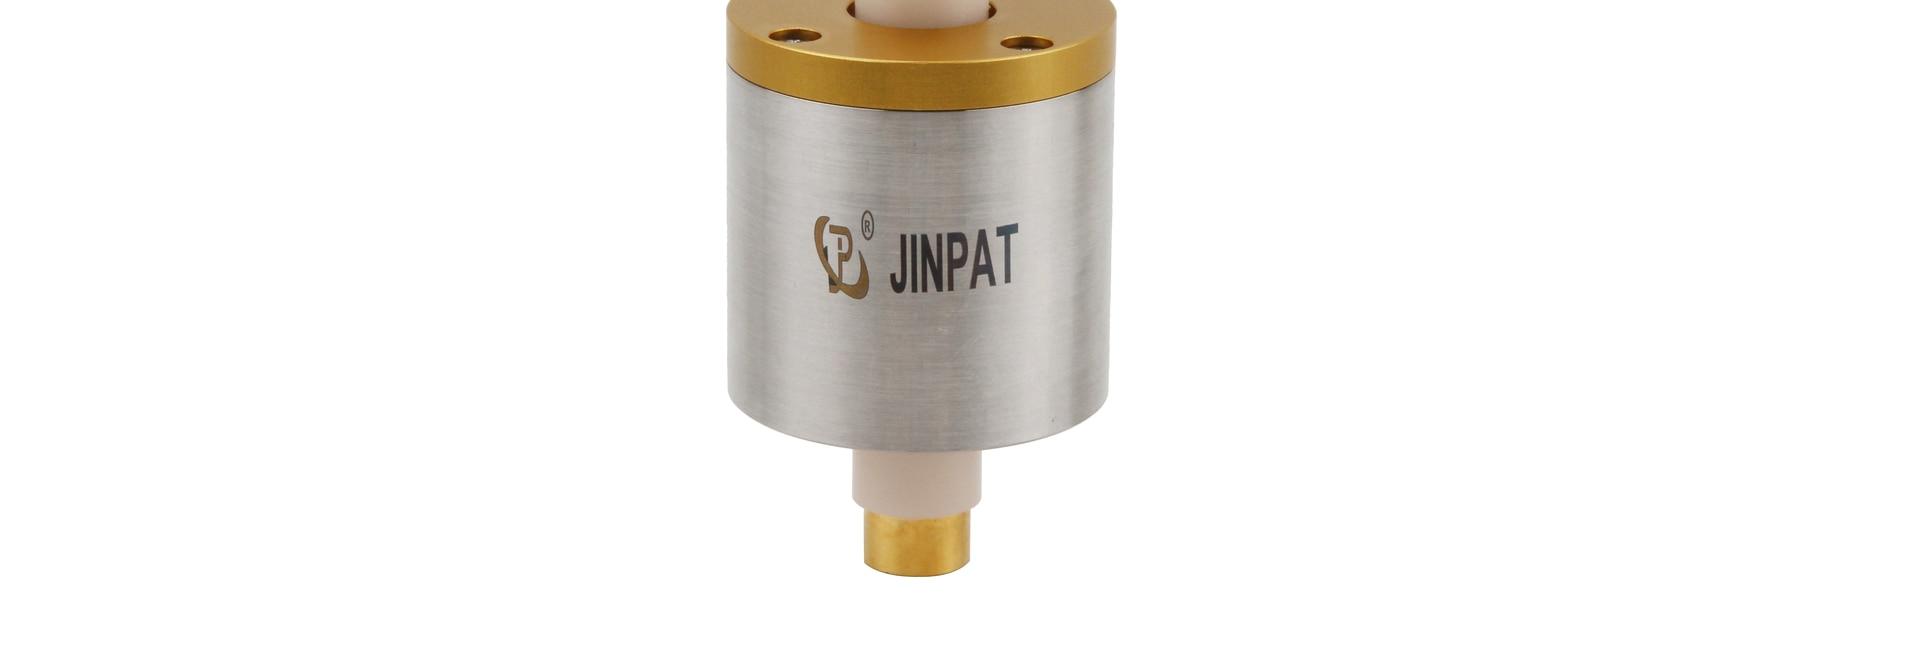 Bague collectrice de contact liquide en métal de JINPAT